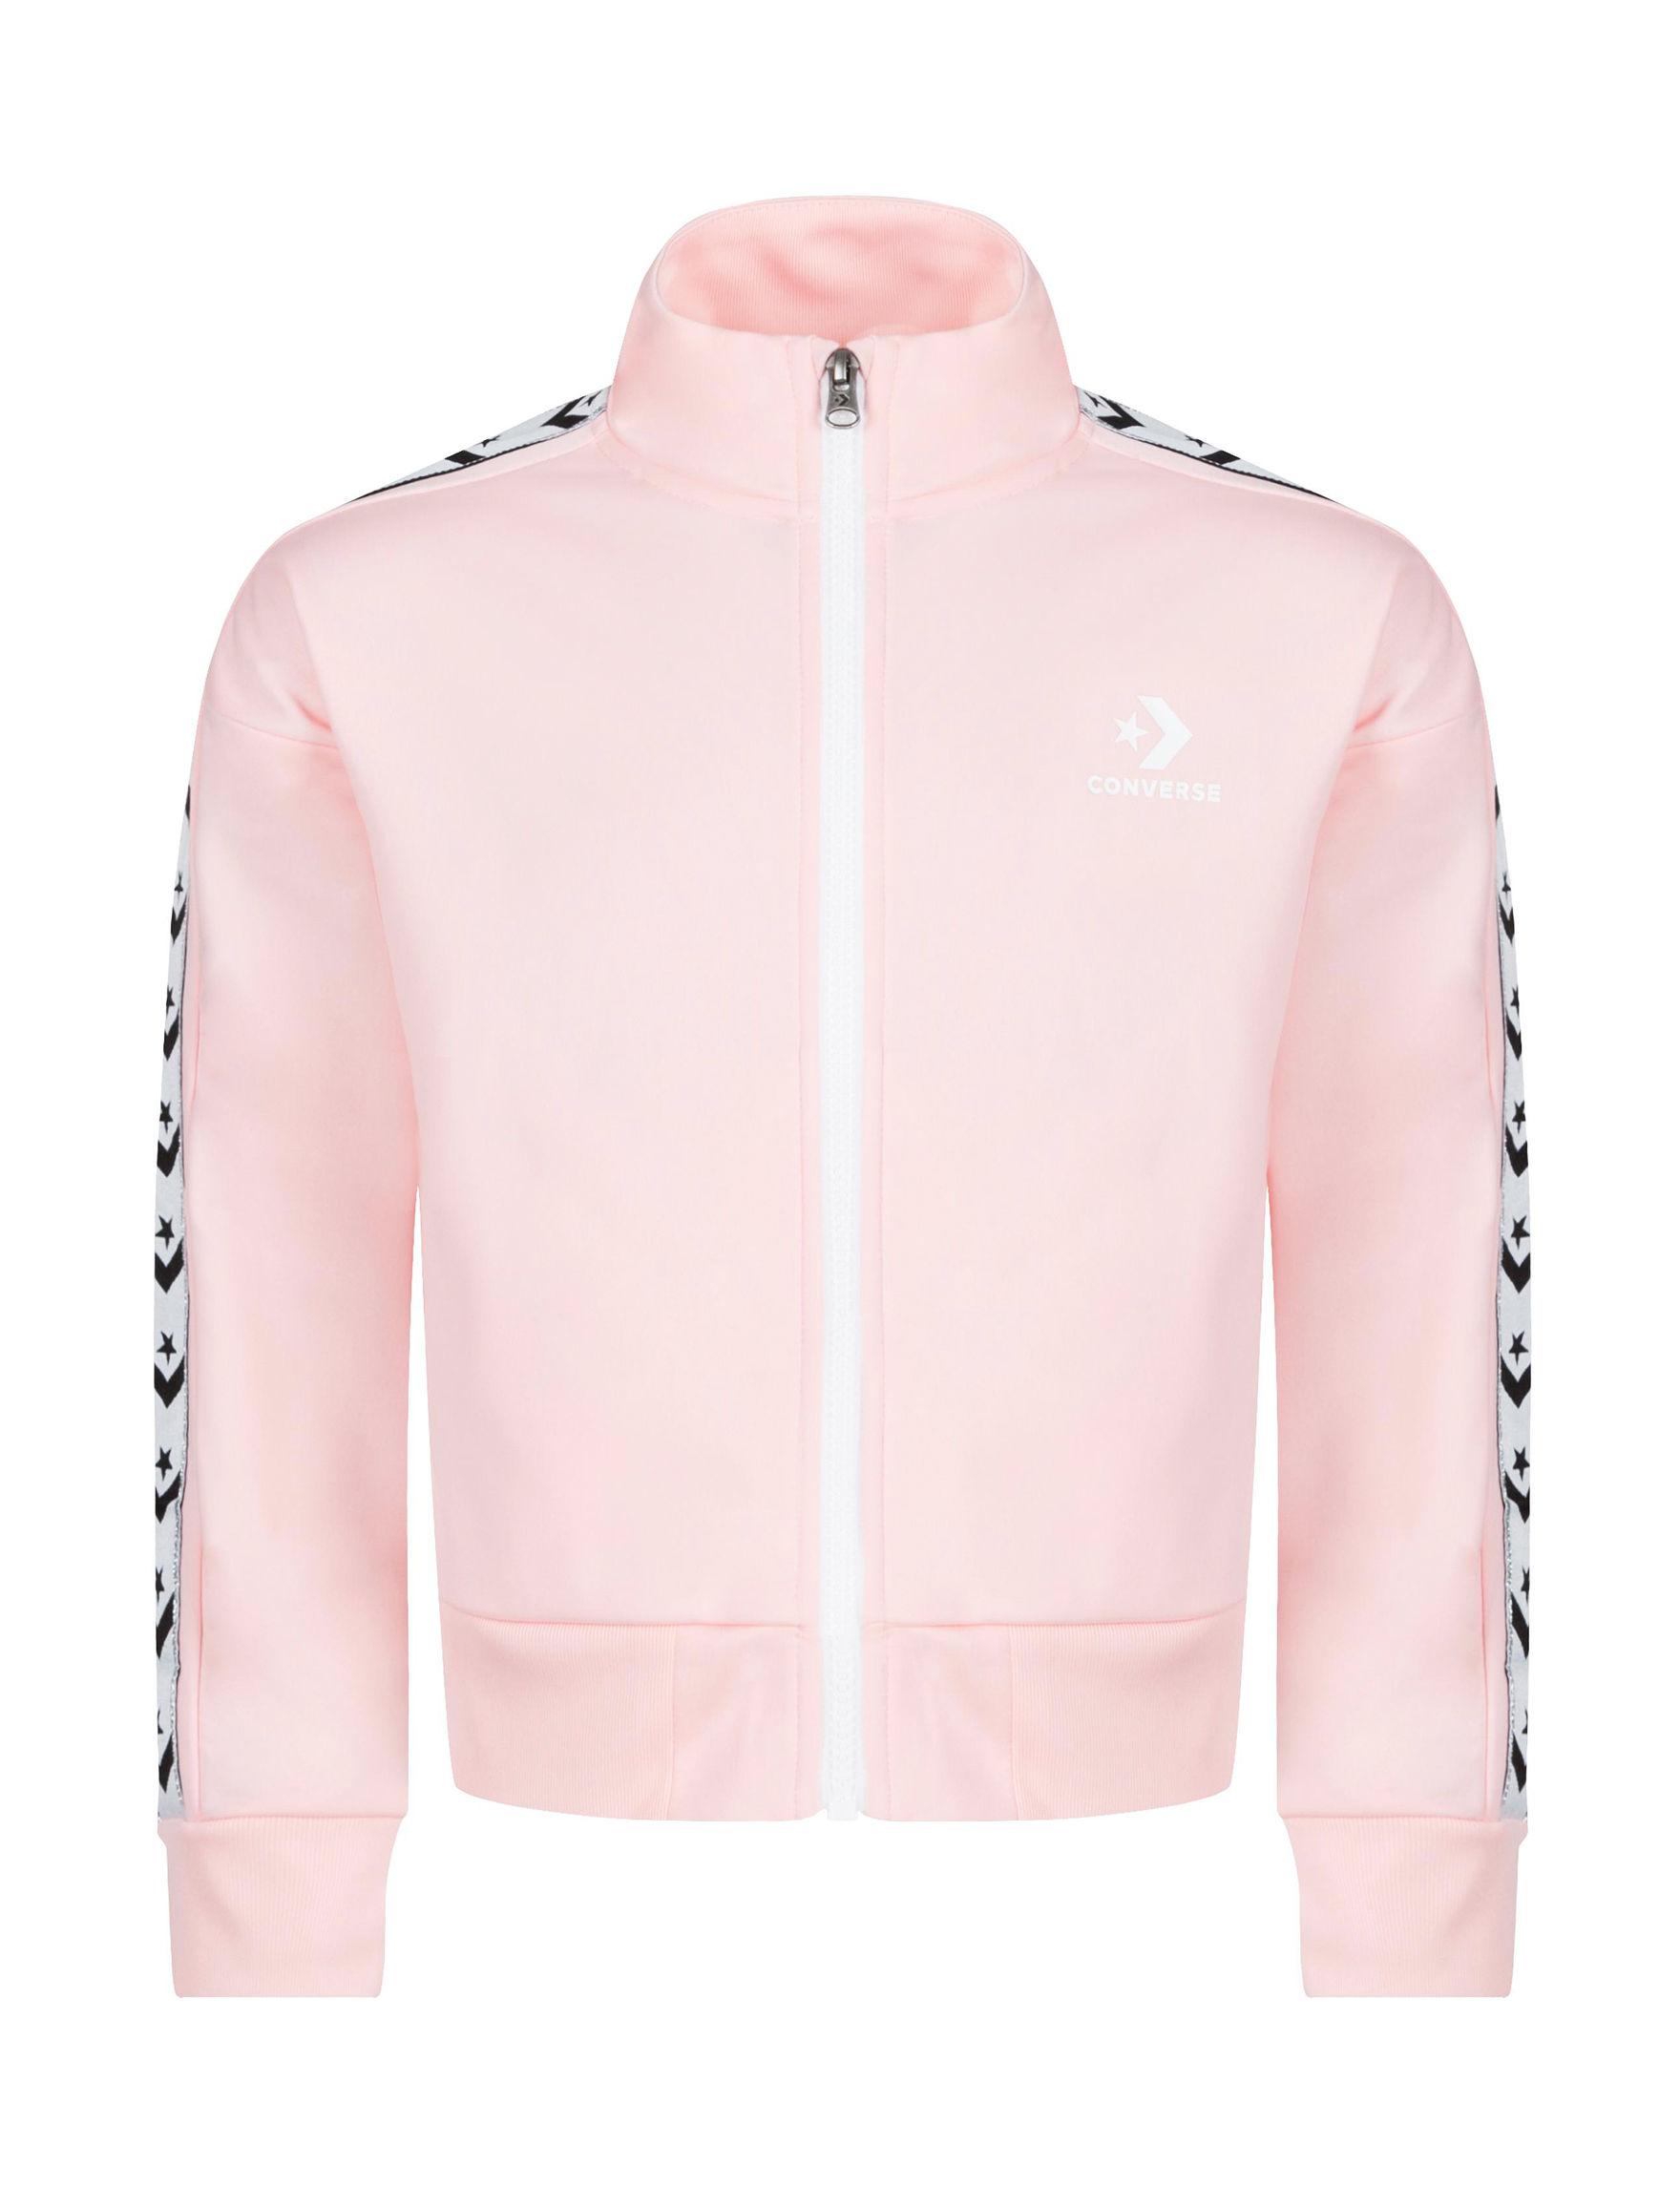 Converse Pink